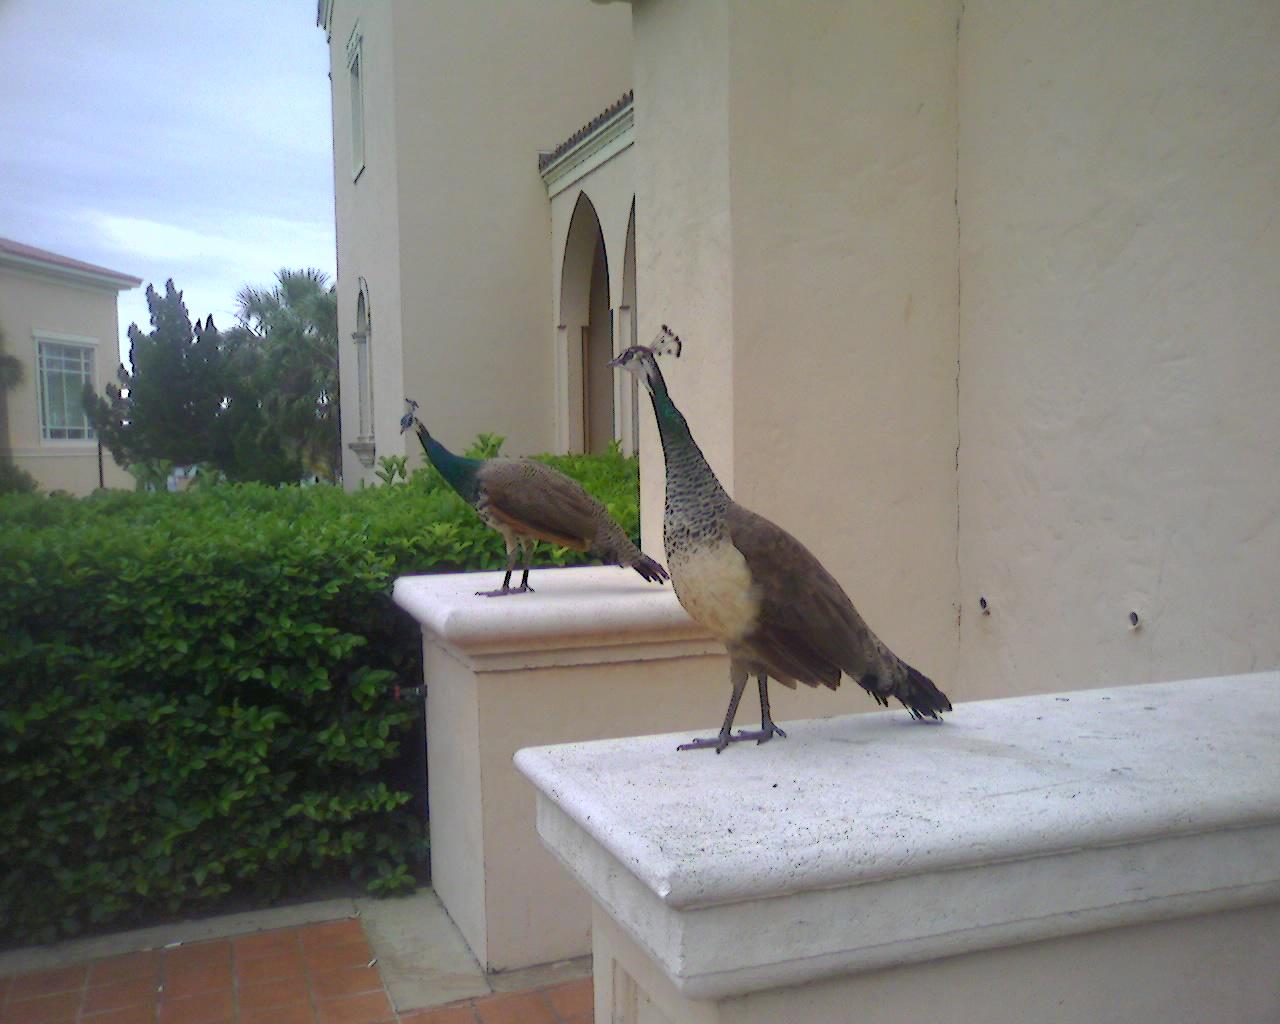 [peacocks]